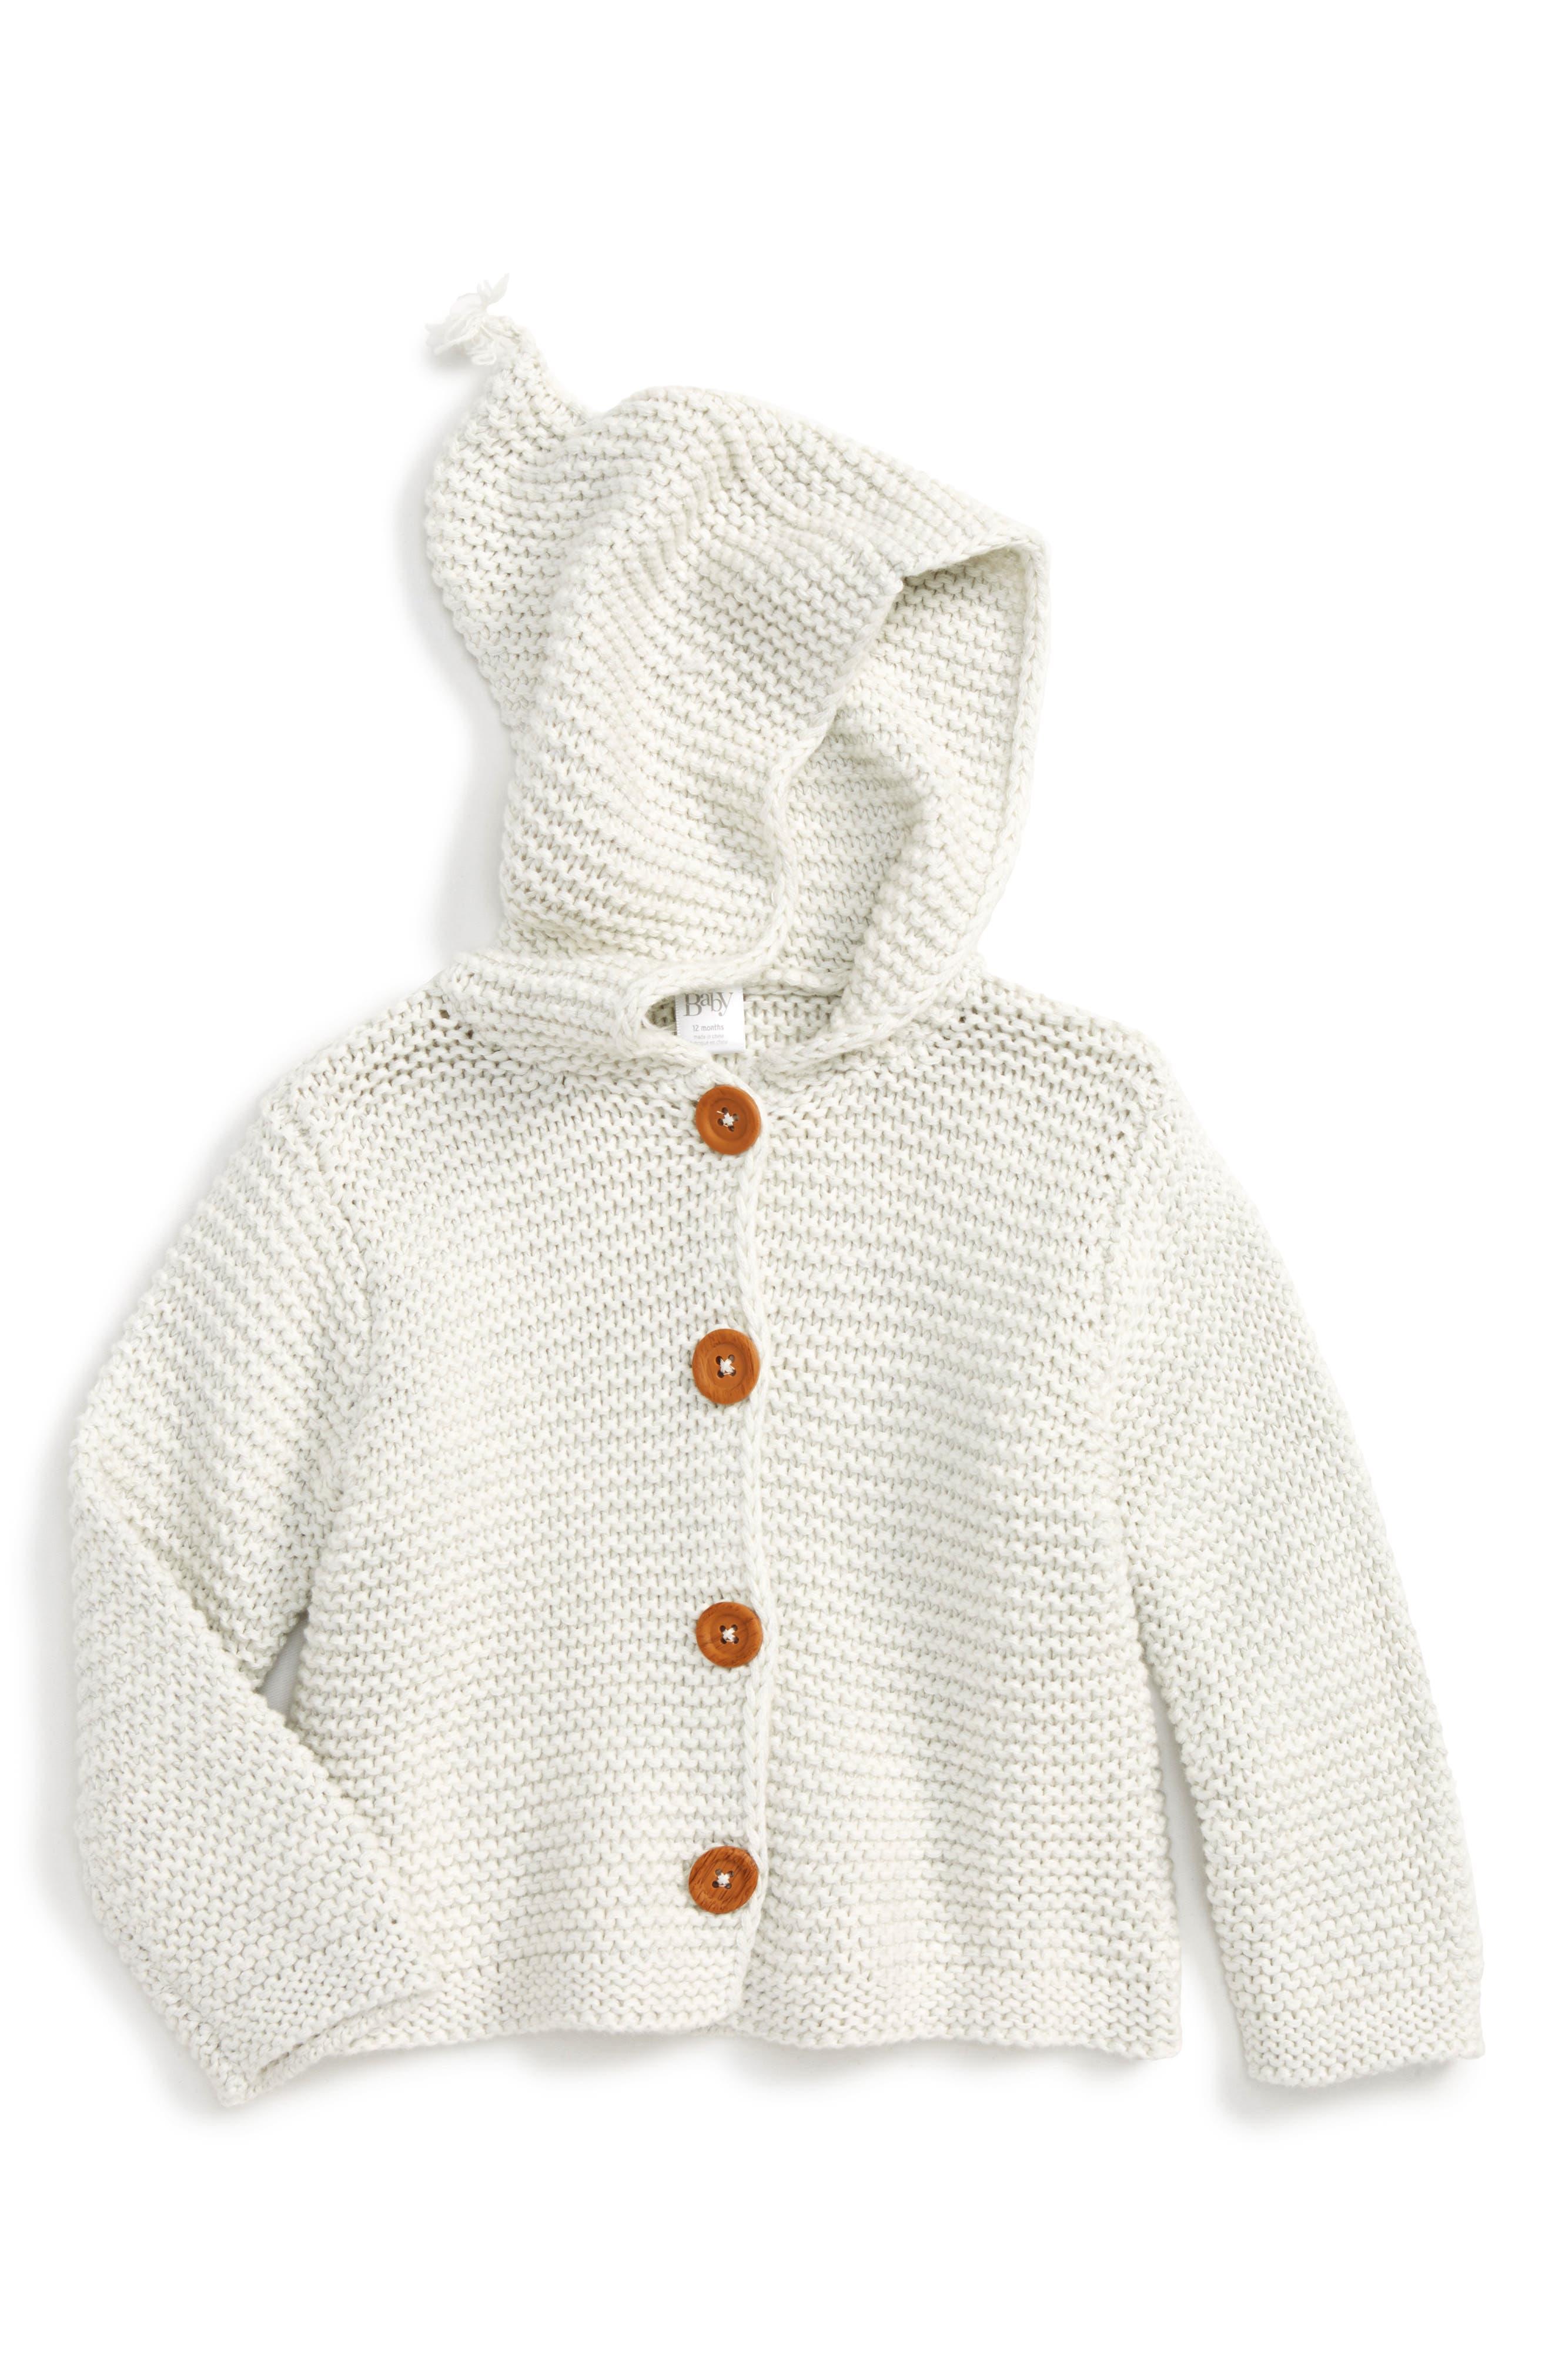 Organic Cotton Hooded Cardigan,                             Main thumbnail 1, color,                             IVORY EGRET HEATHER